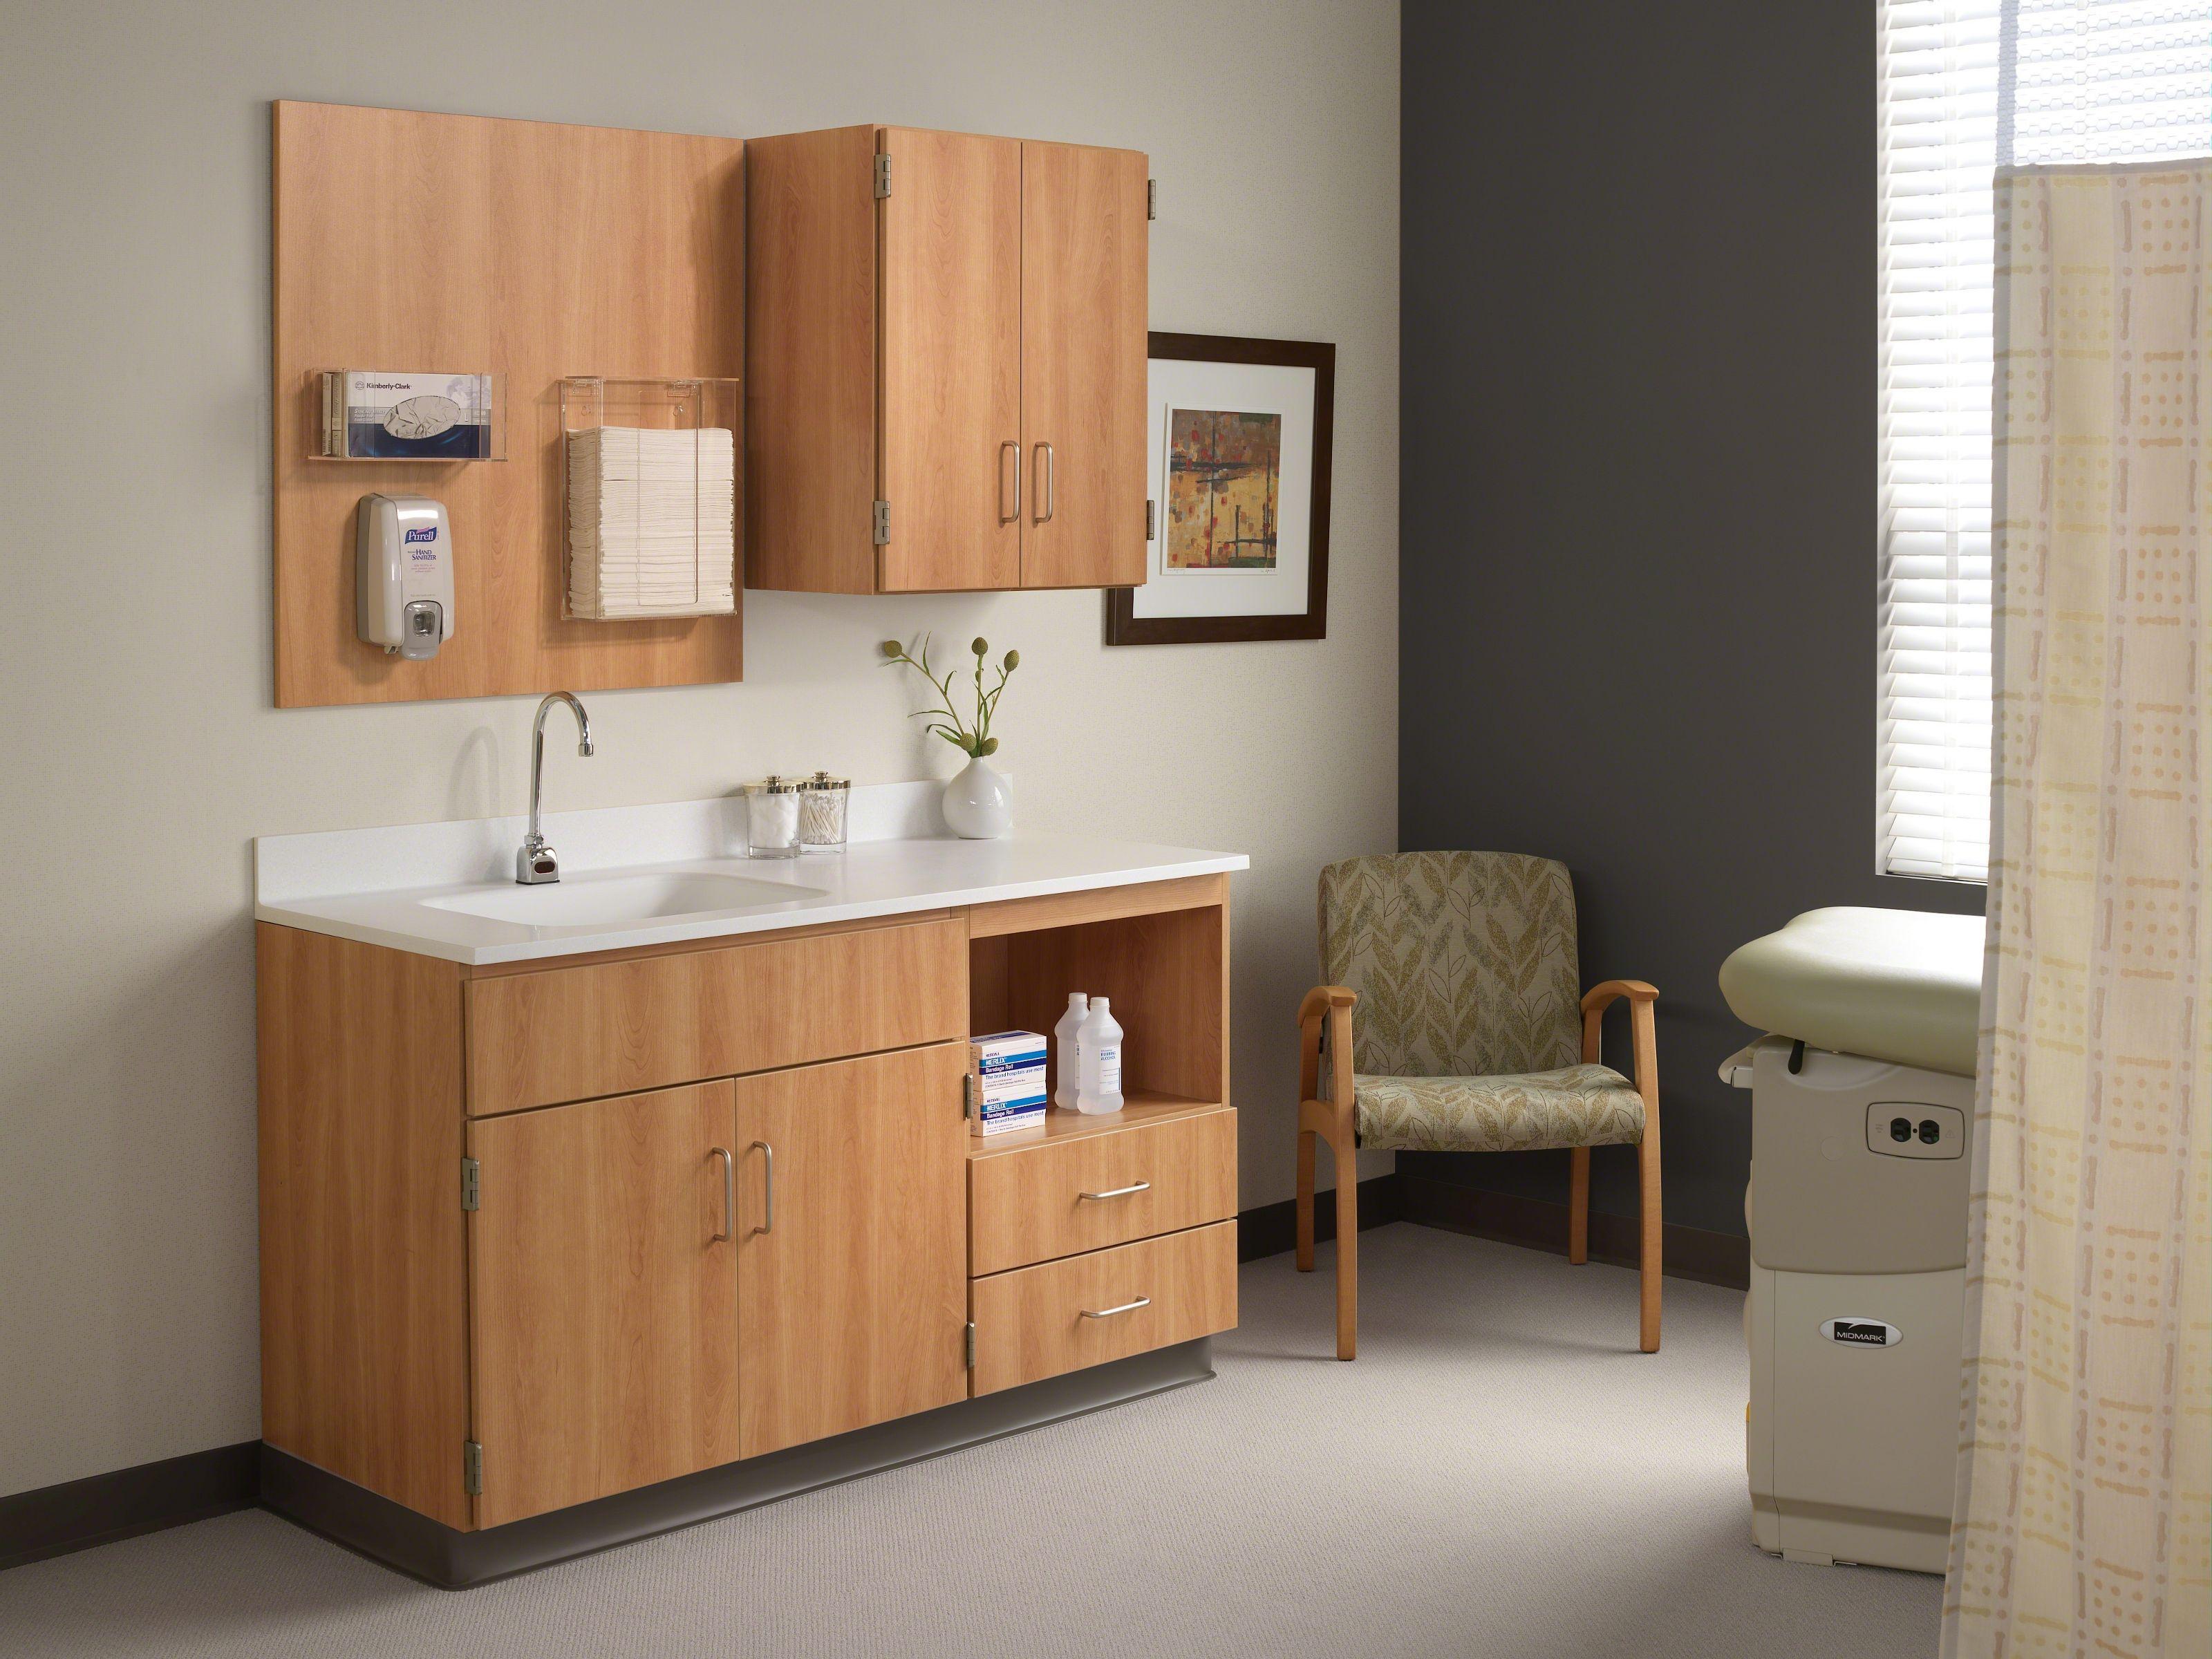 Astonishing Folio Steelcase Health Office Cabinets Storage Cabinets Interior Design Ideas Gentotthenellocom